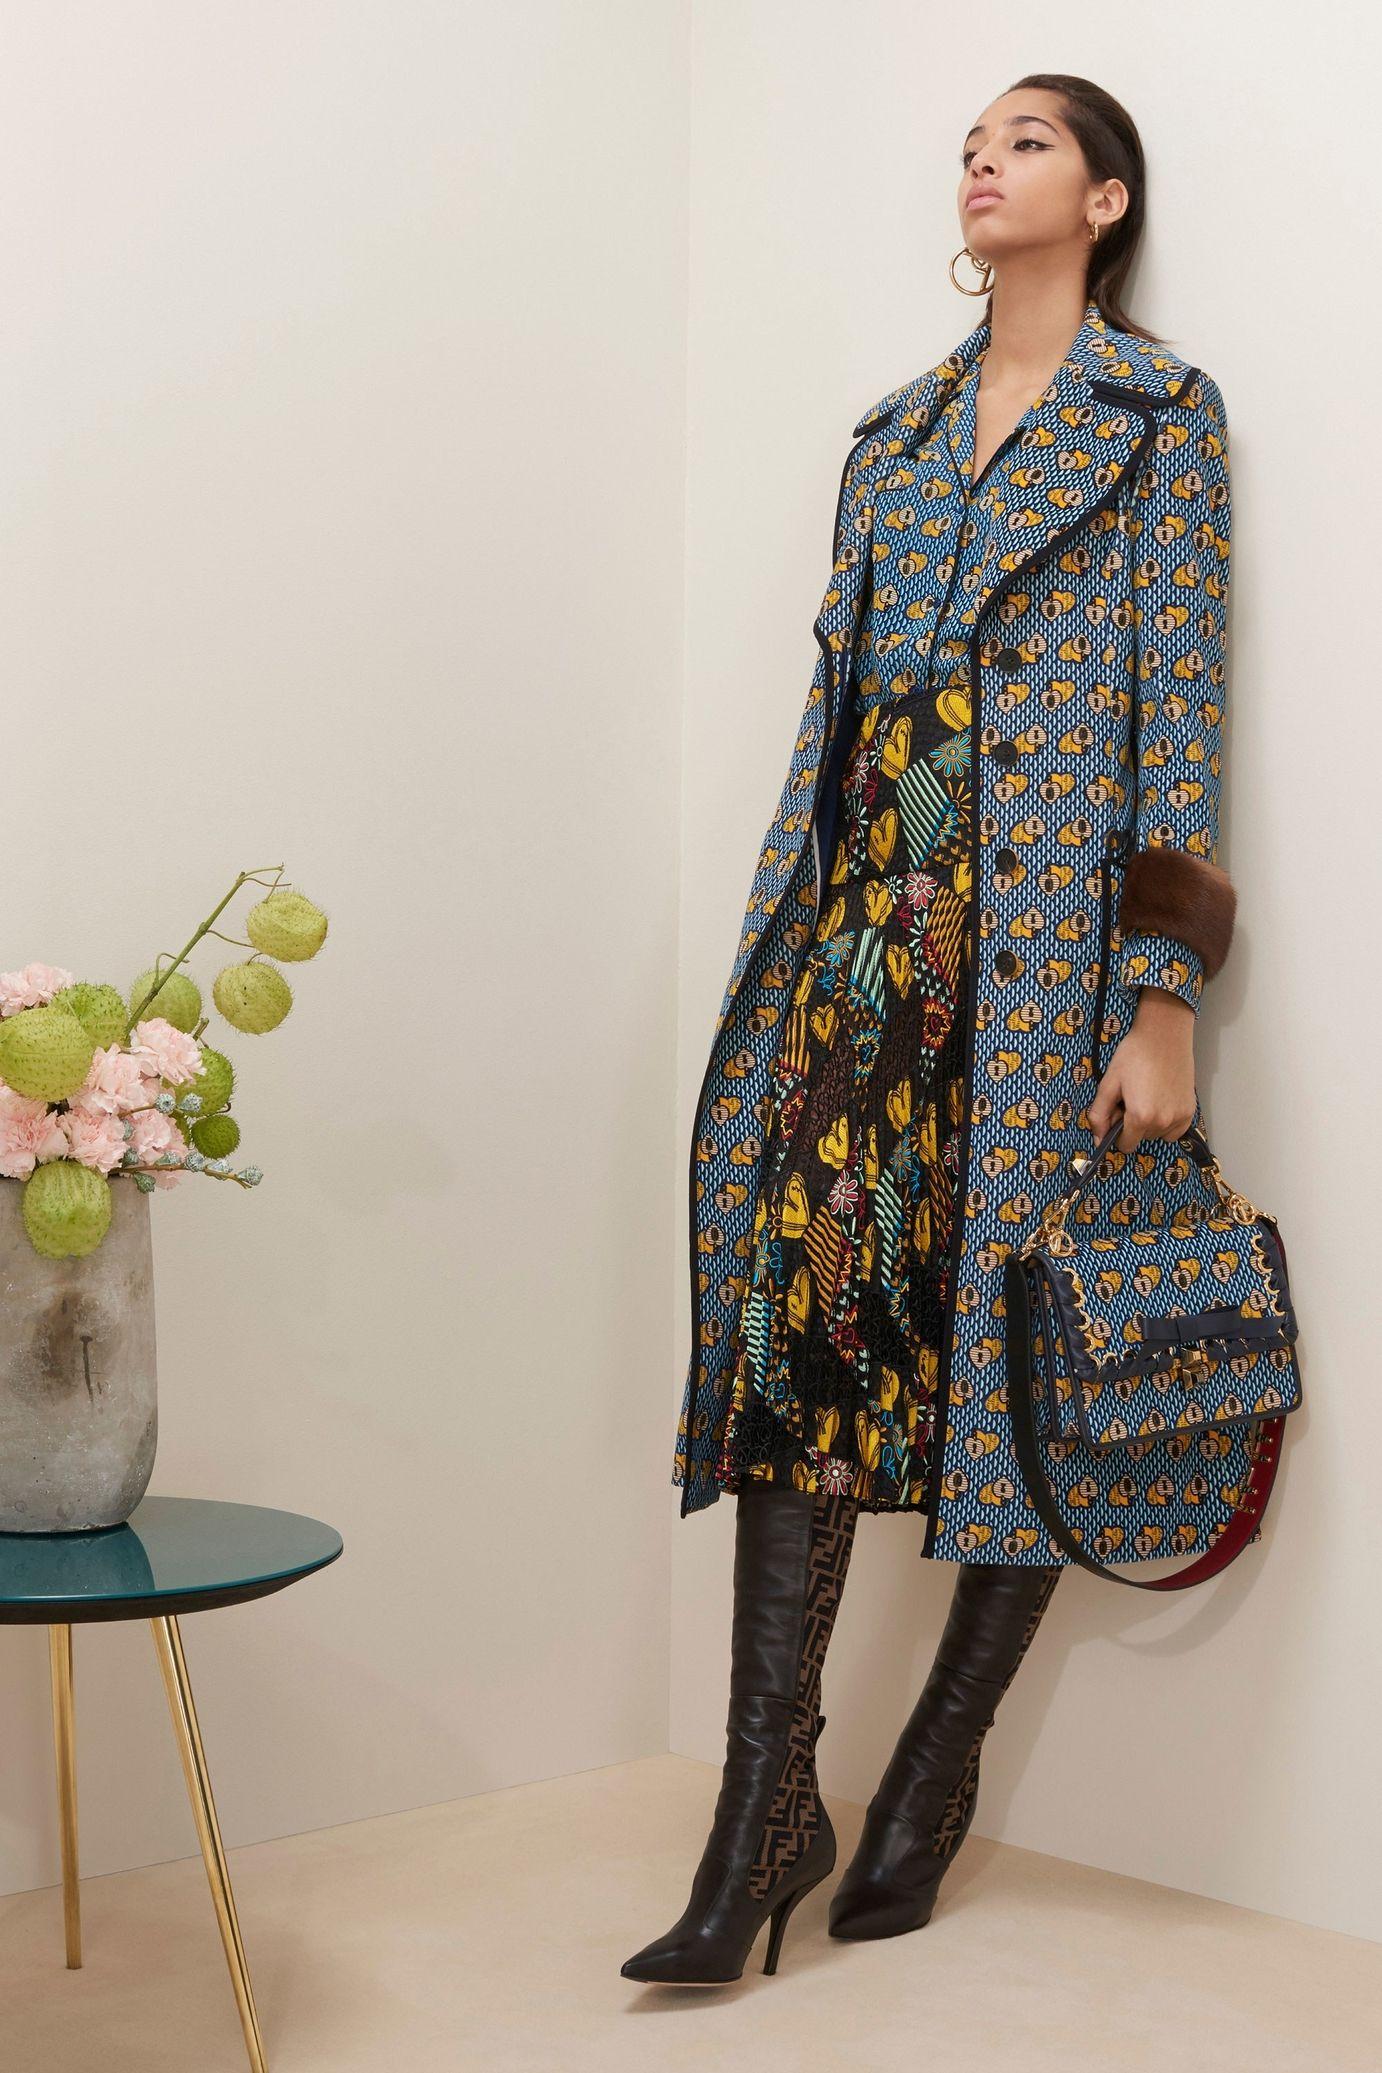 72291a6399f08 Défilés en 2019 | Lookbook & Editorial | Fendi, Mode femme et ...